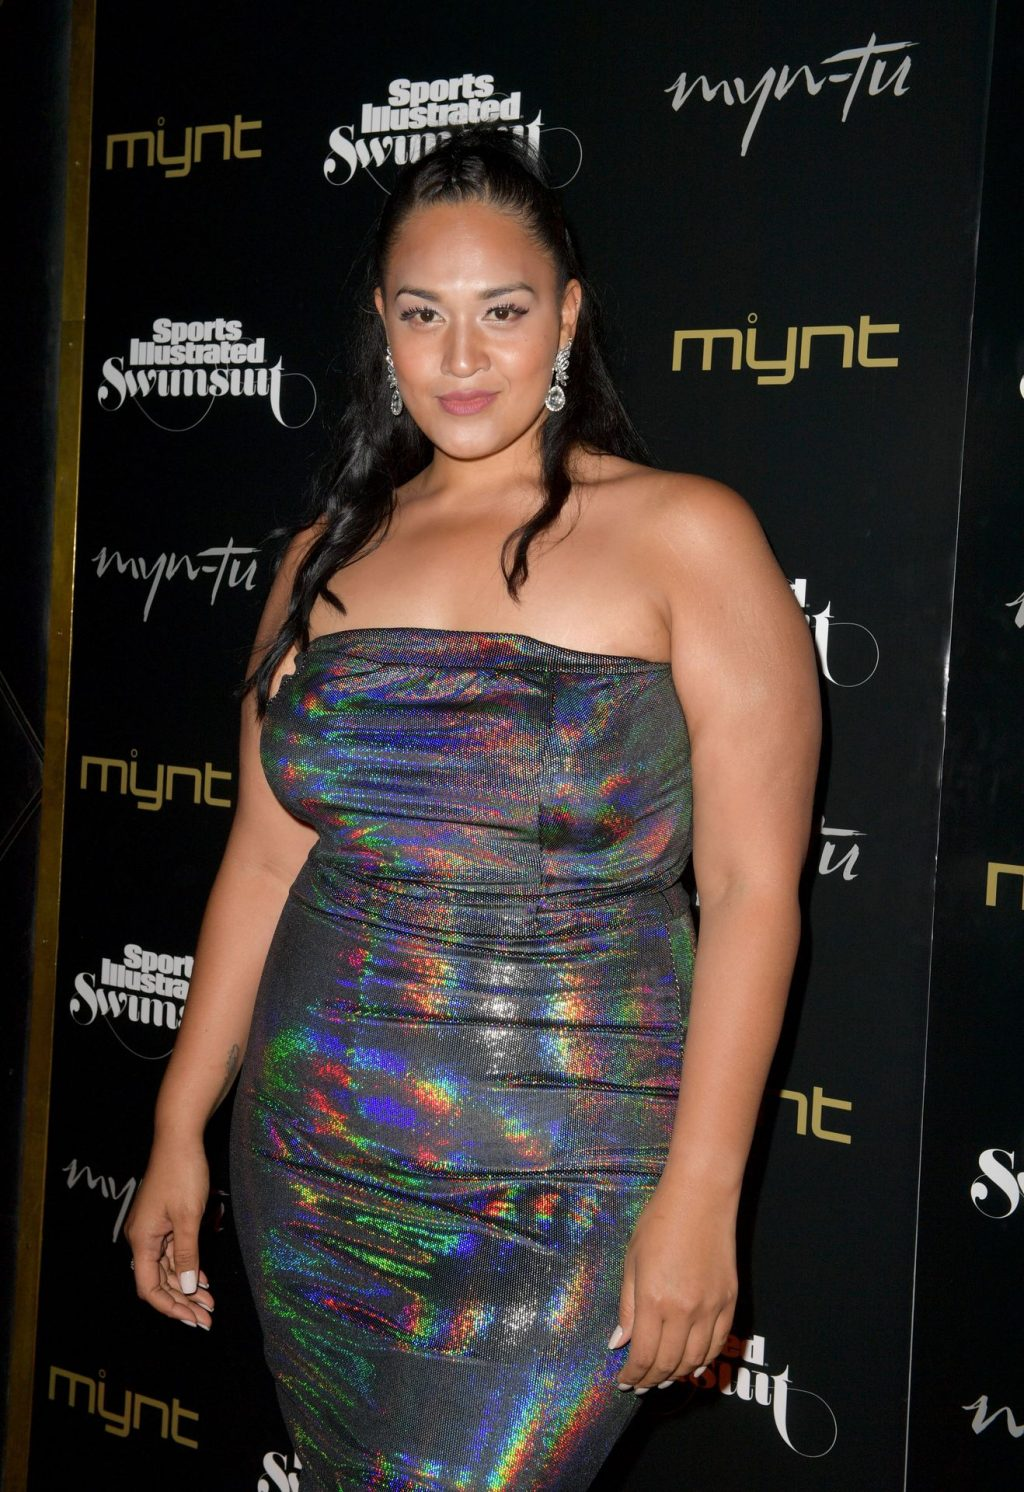 Veronica nackt Pome'e Sports Illustrated